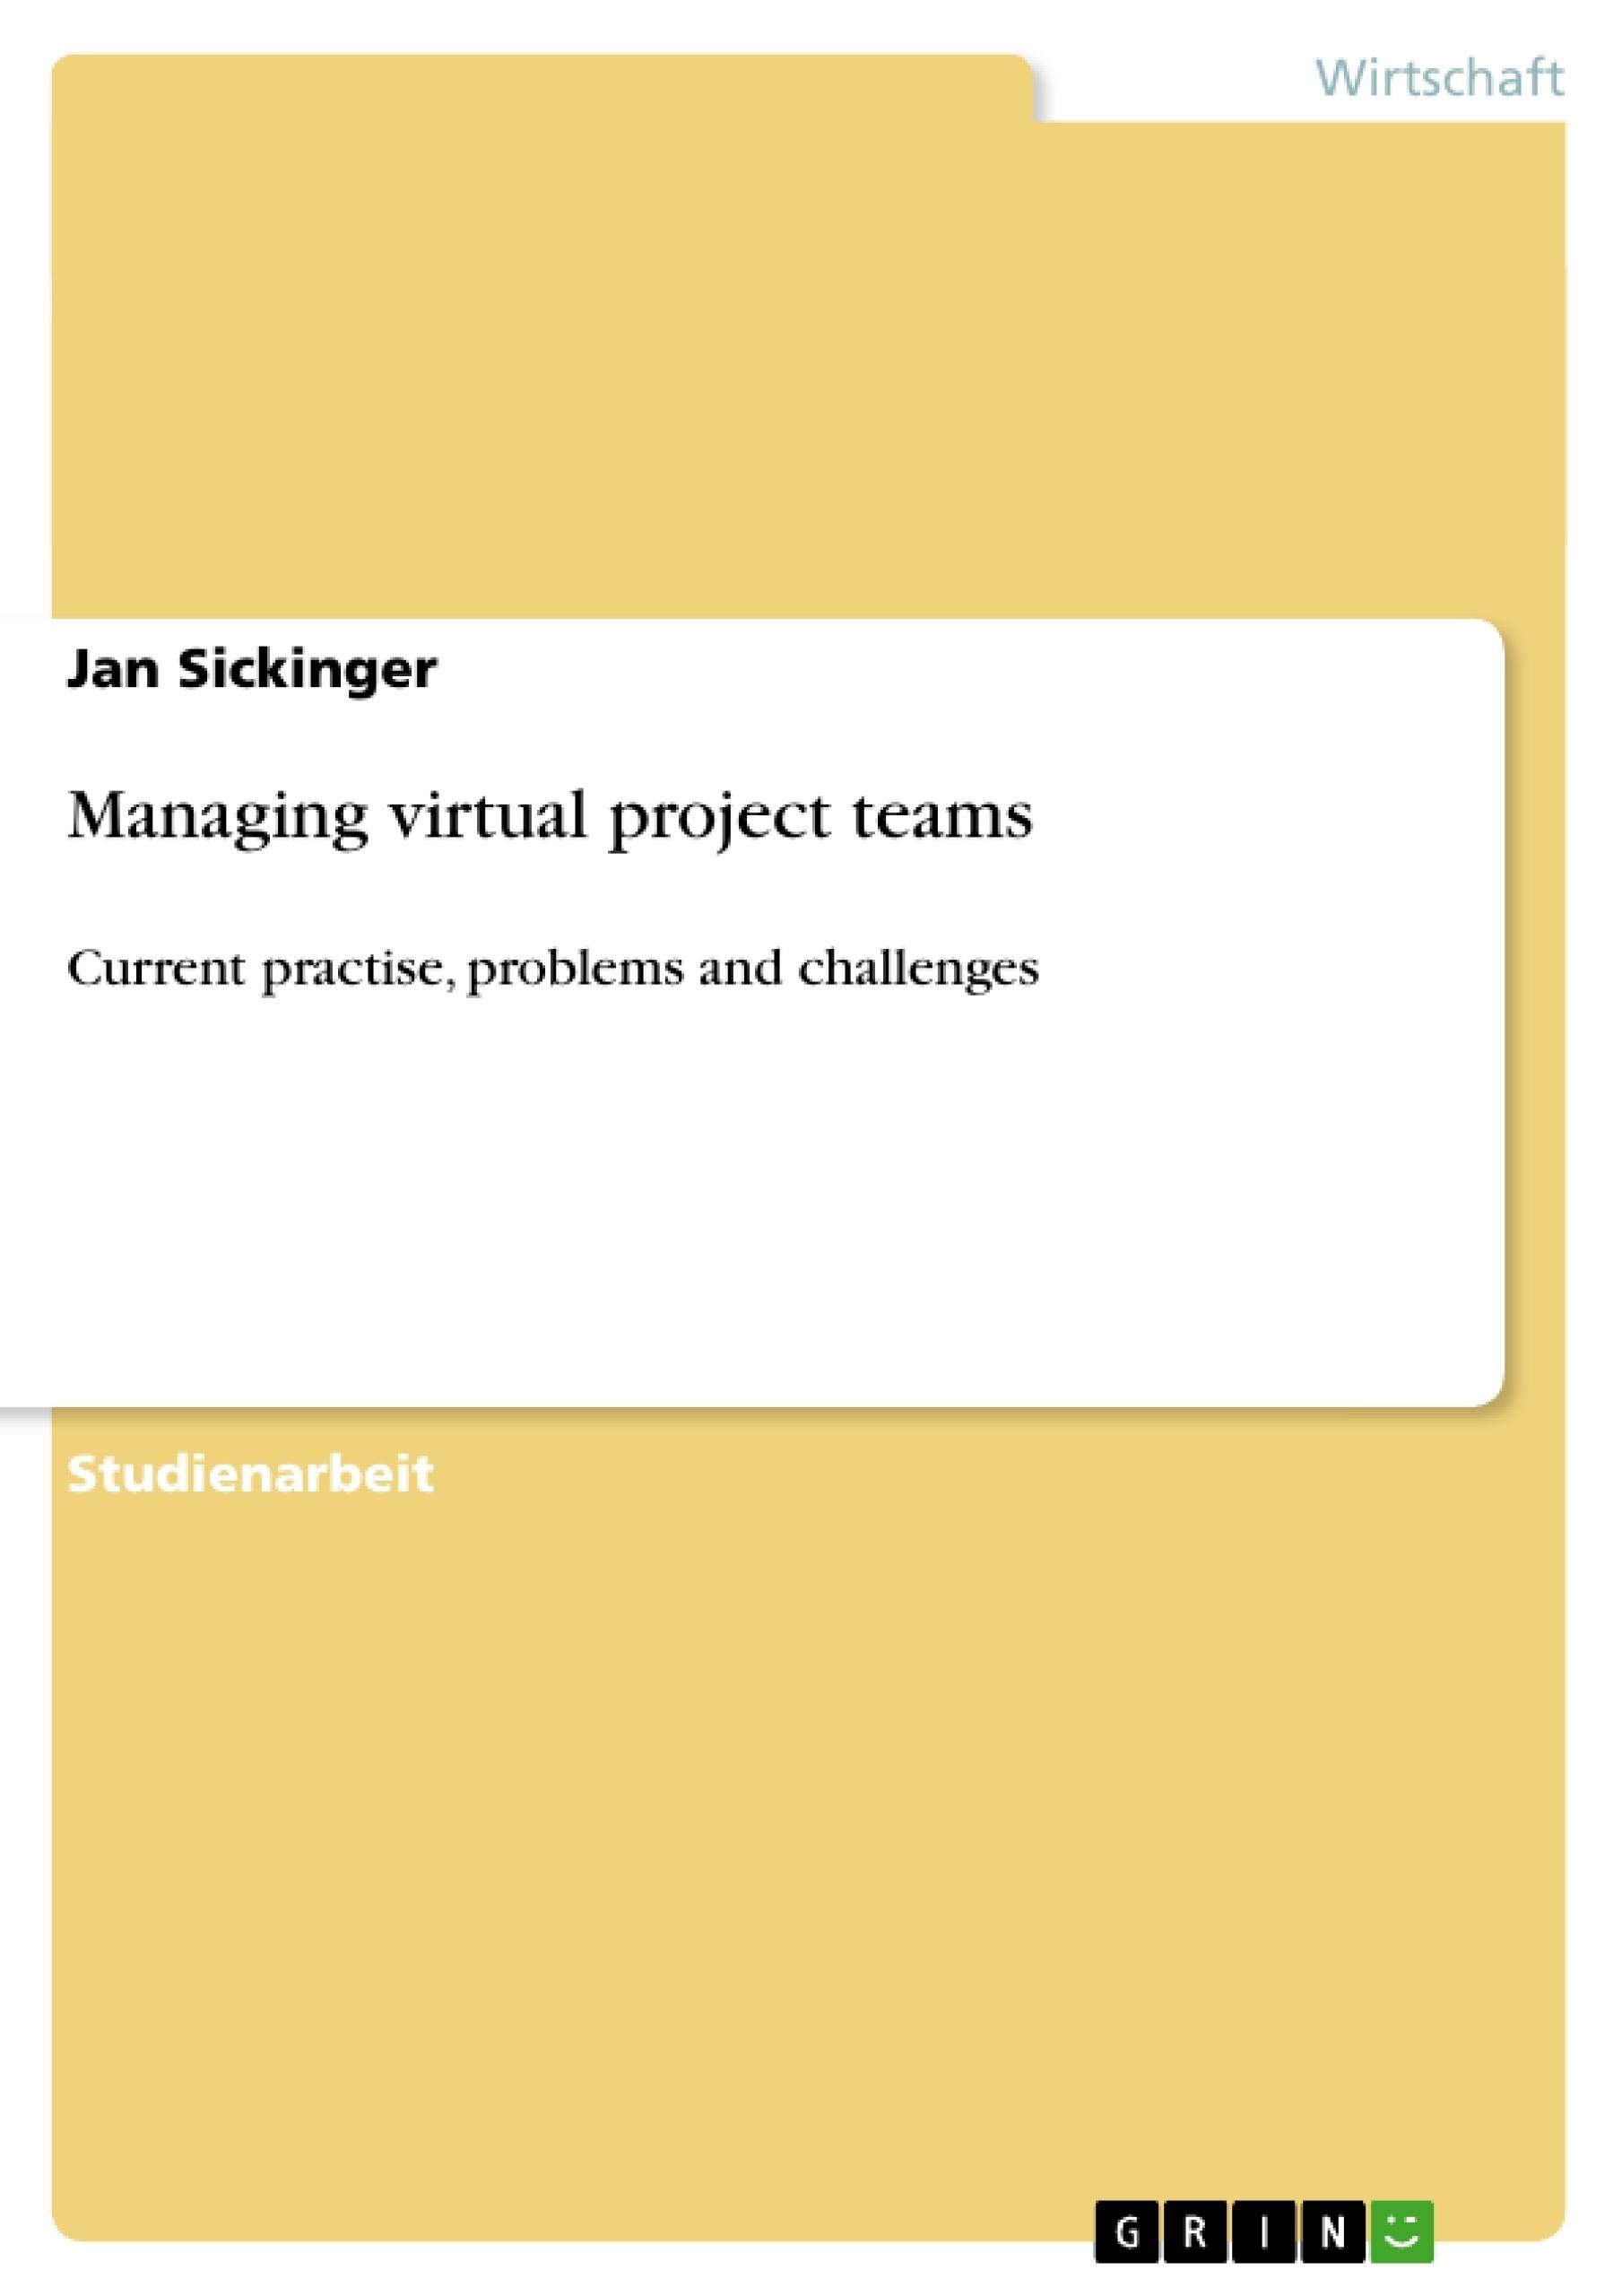 Titel: Managing virtual project teams